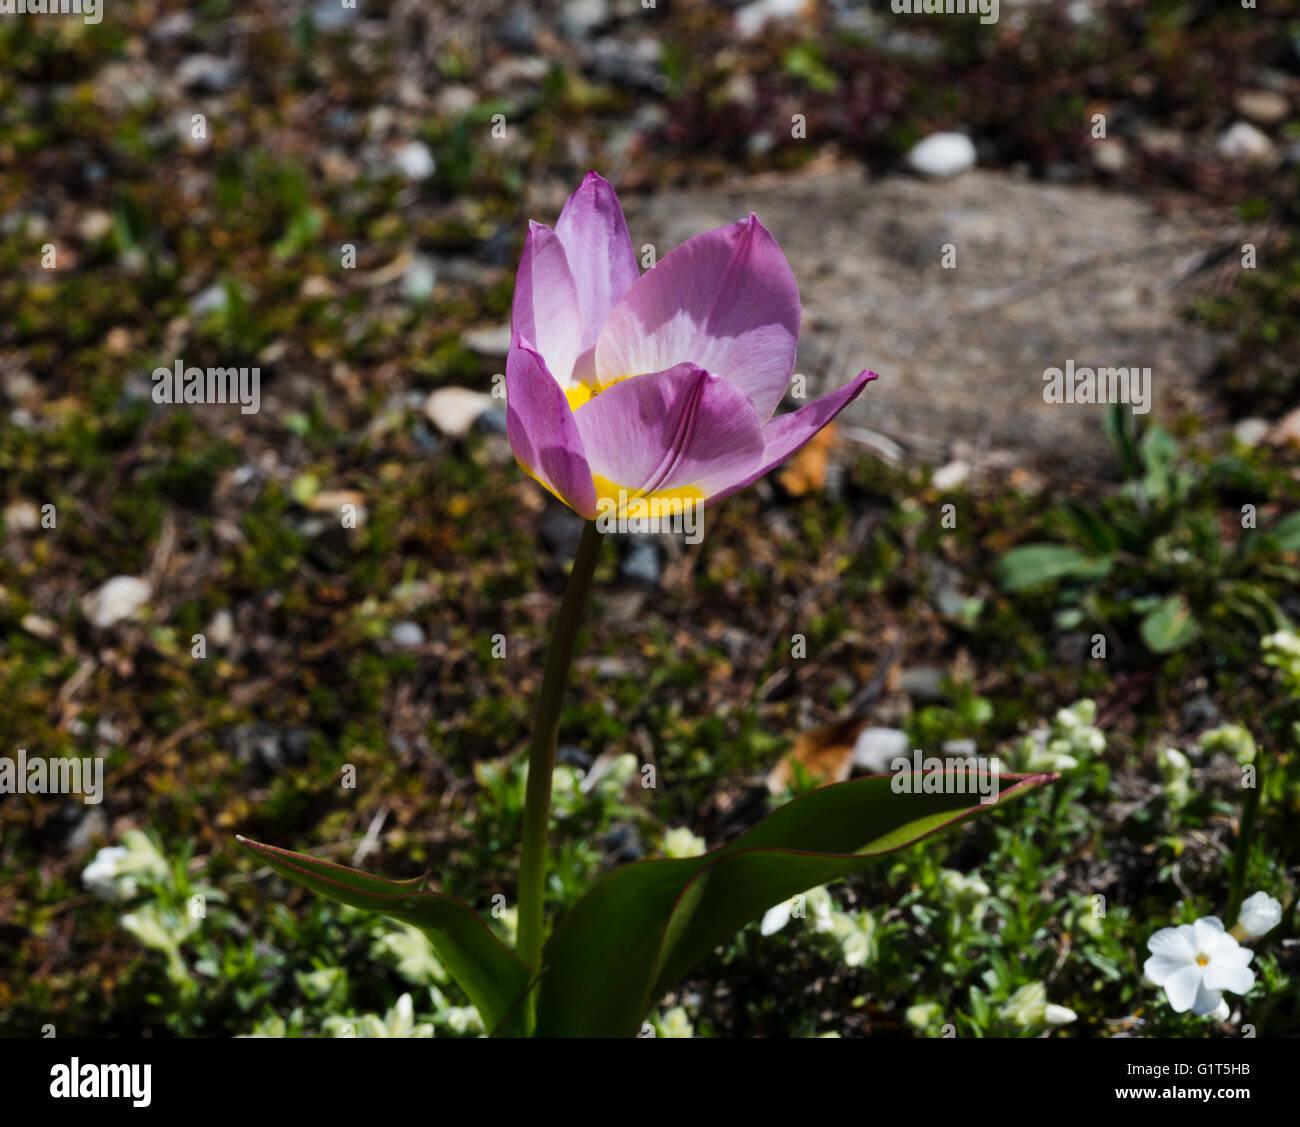 Kyrgystan mountain tulip - Stock Image